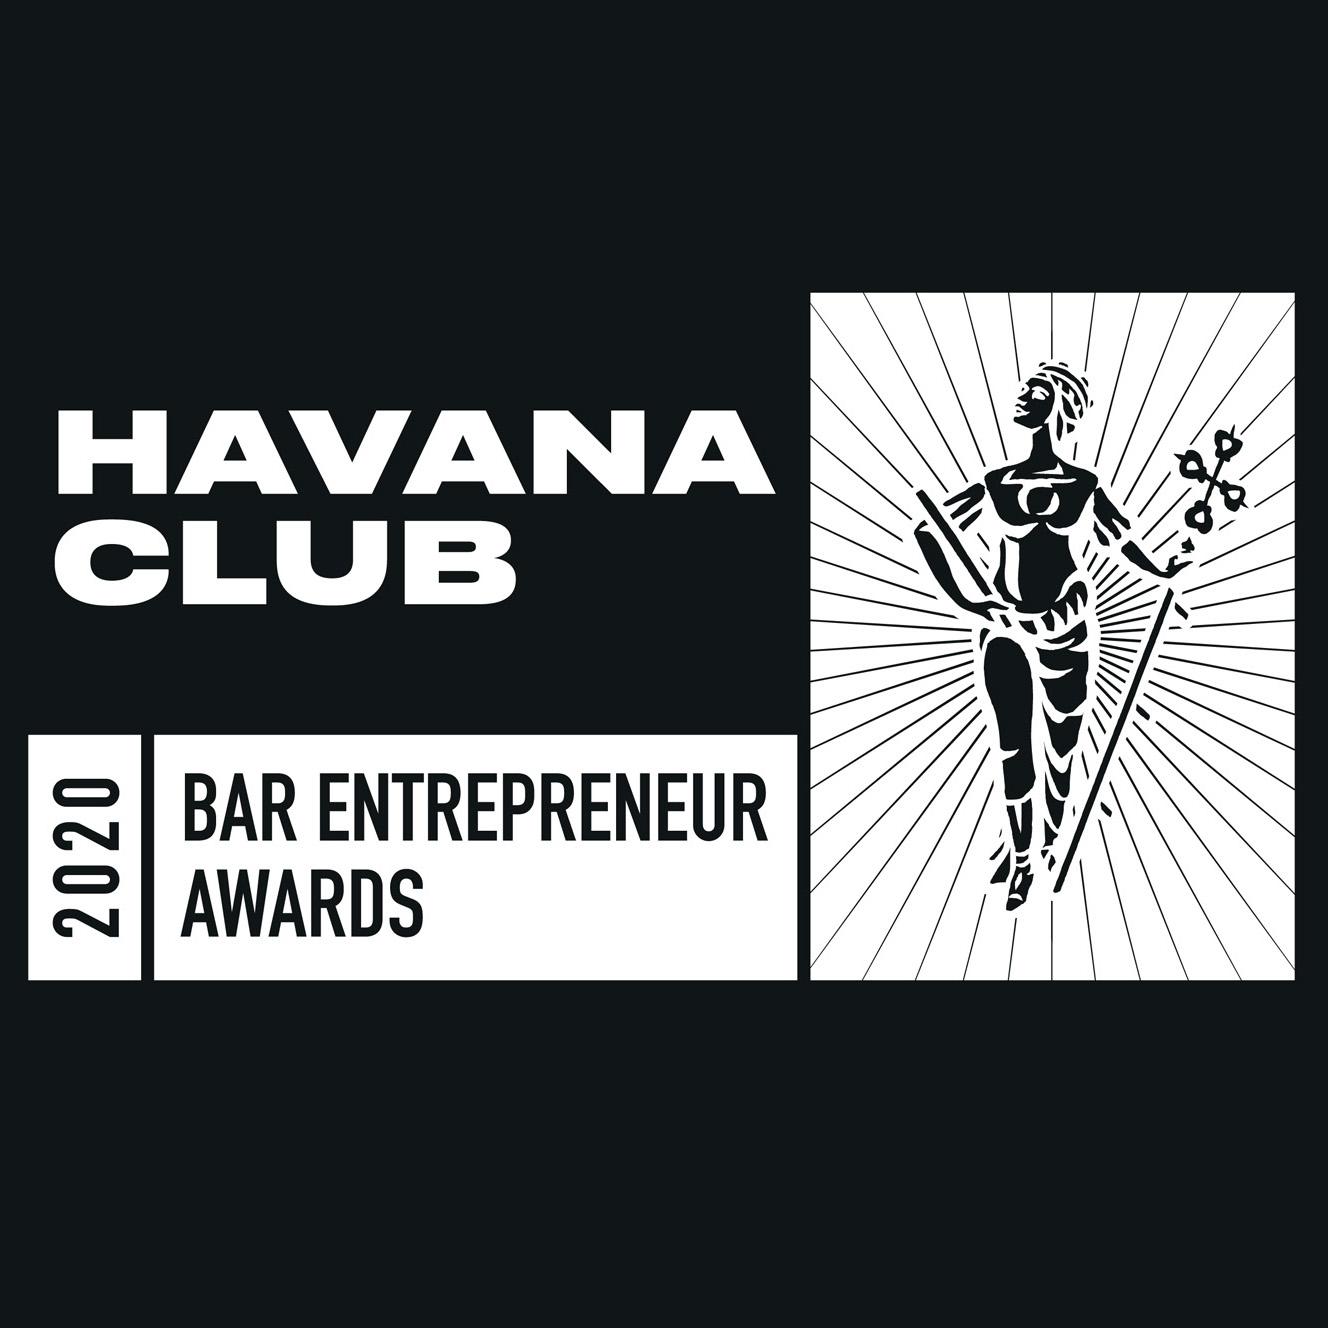 havana club bar entrepreneur awards 2020